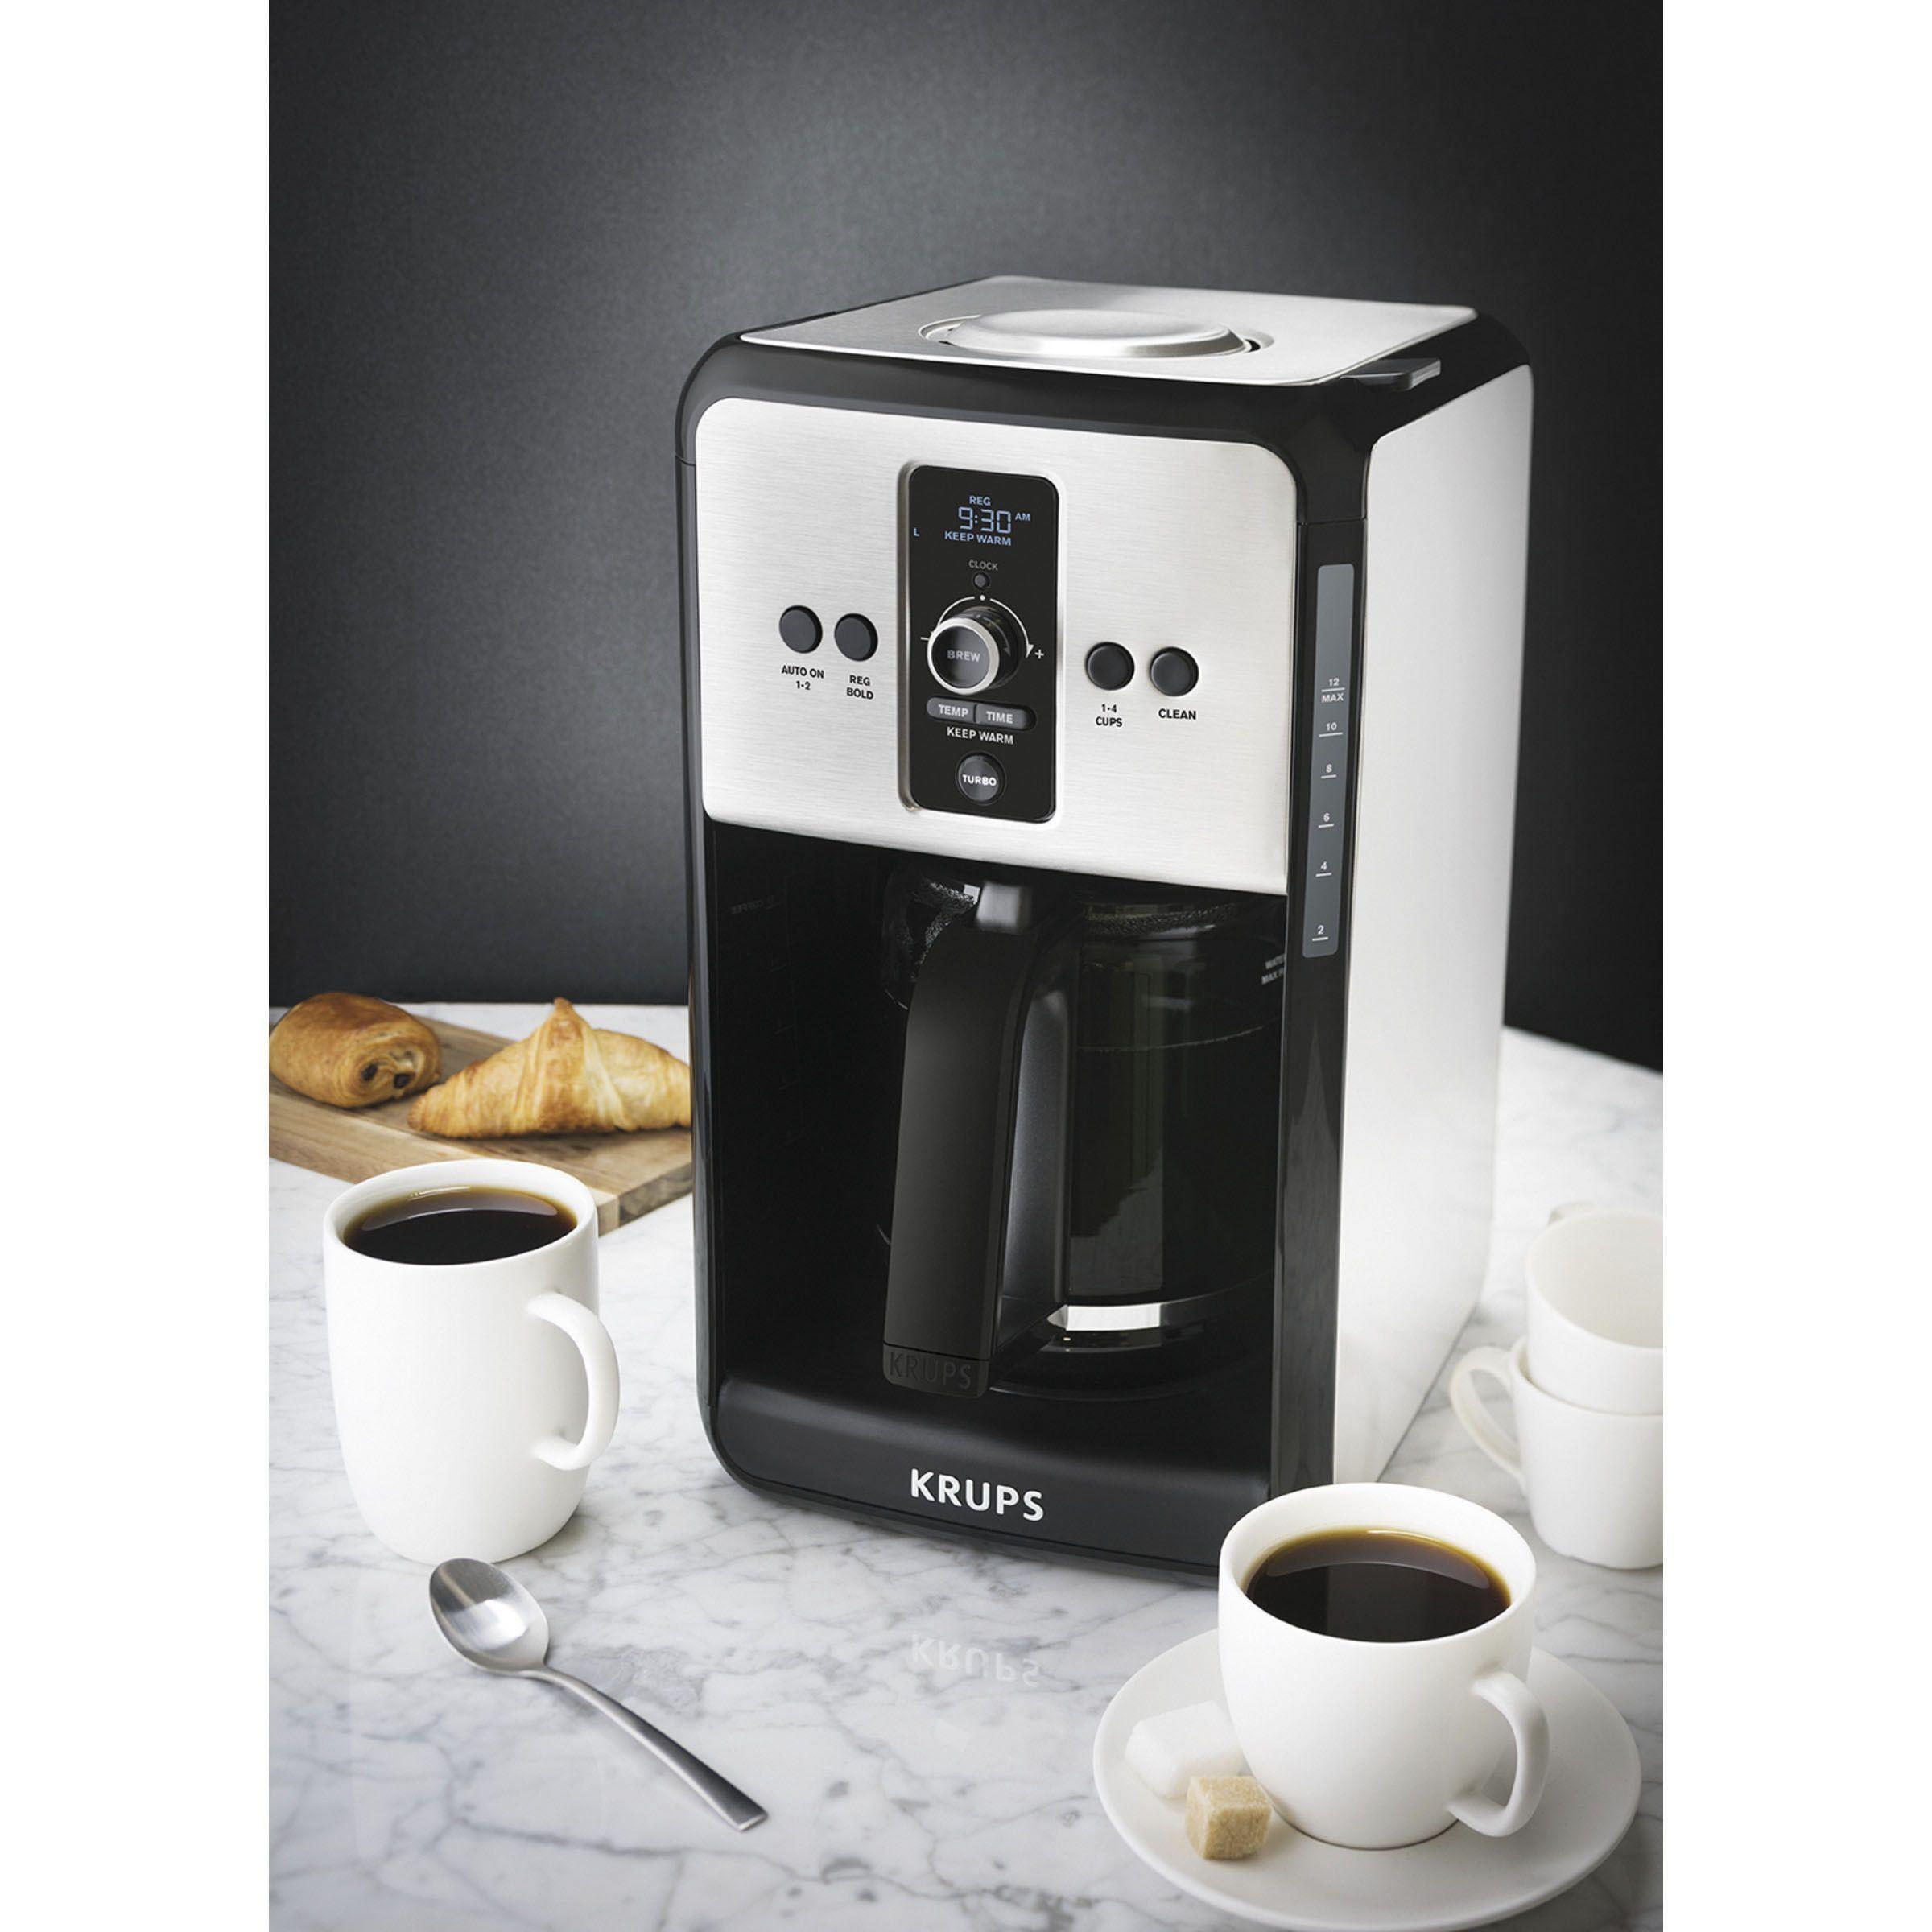 Krups Ec412050 Savoy Turbo Coffee Maker (Blackstainless) (Stainless Steel)